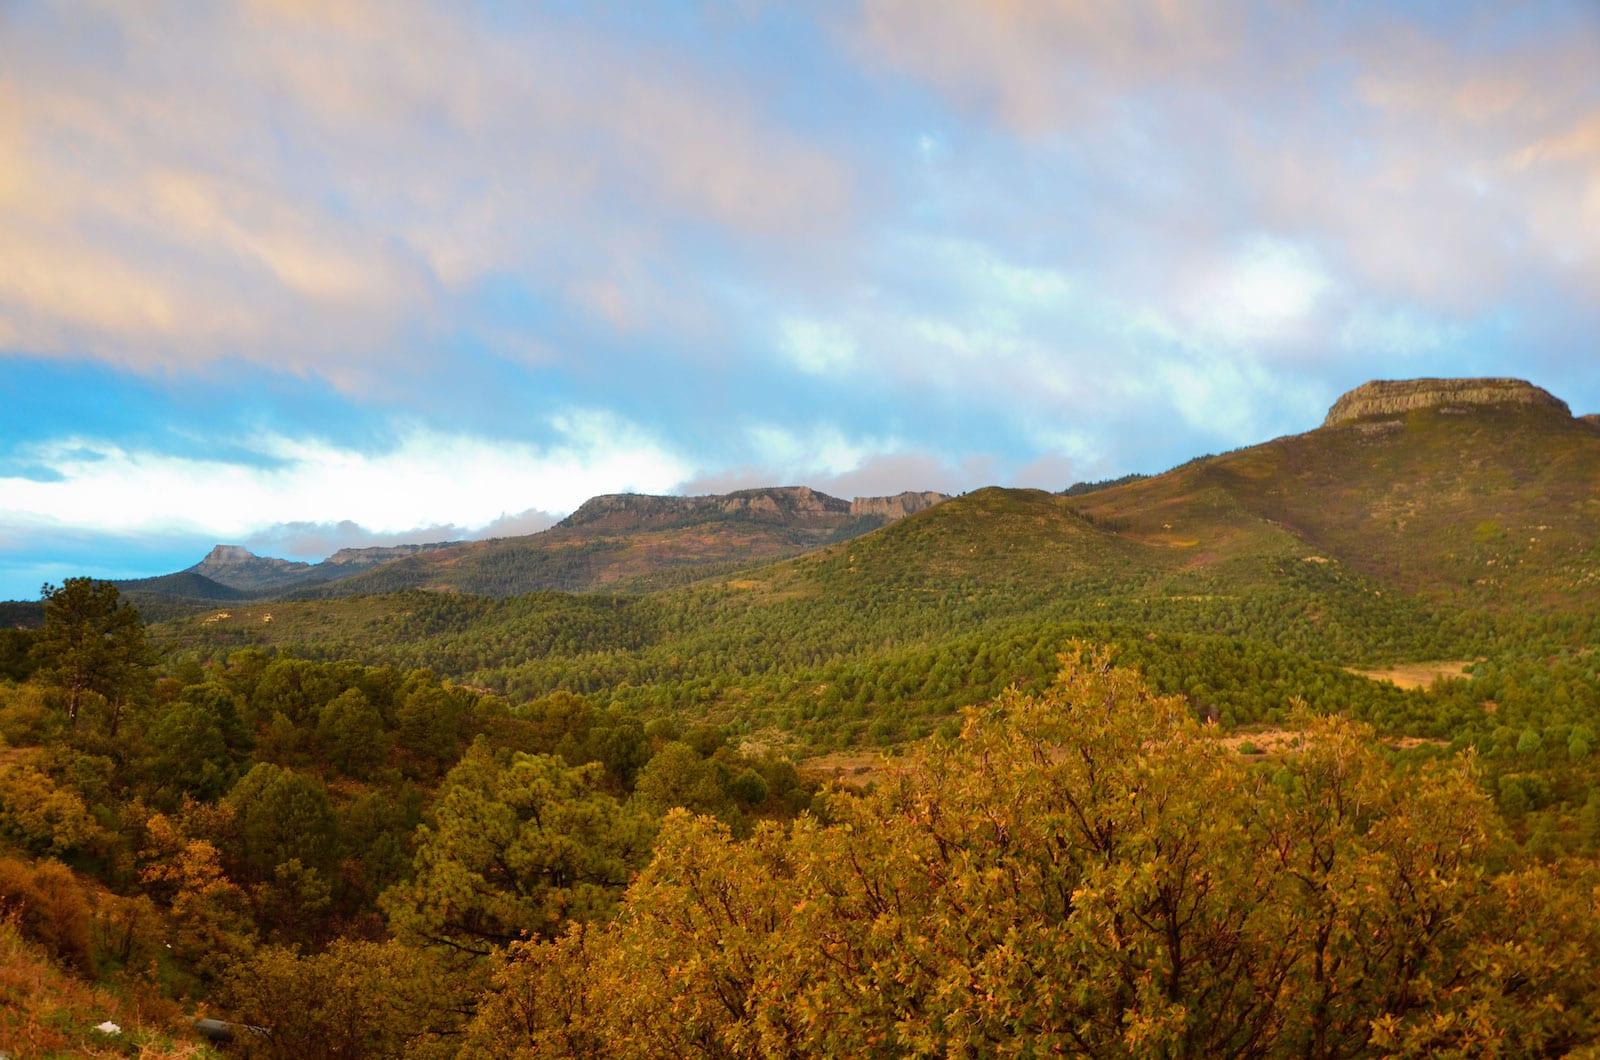 Raton Pass Colorado Autumn Scenery